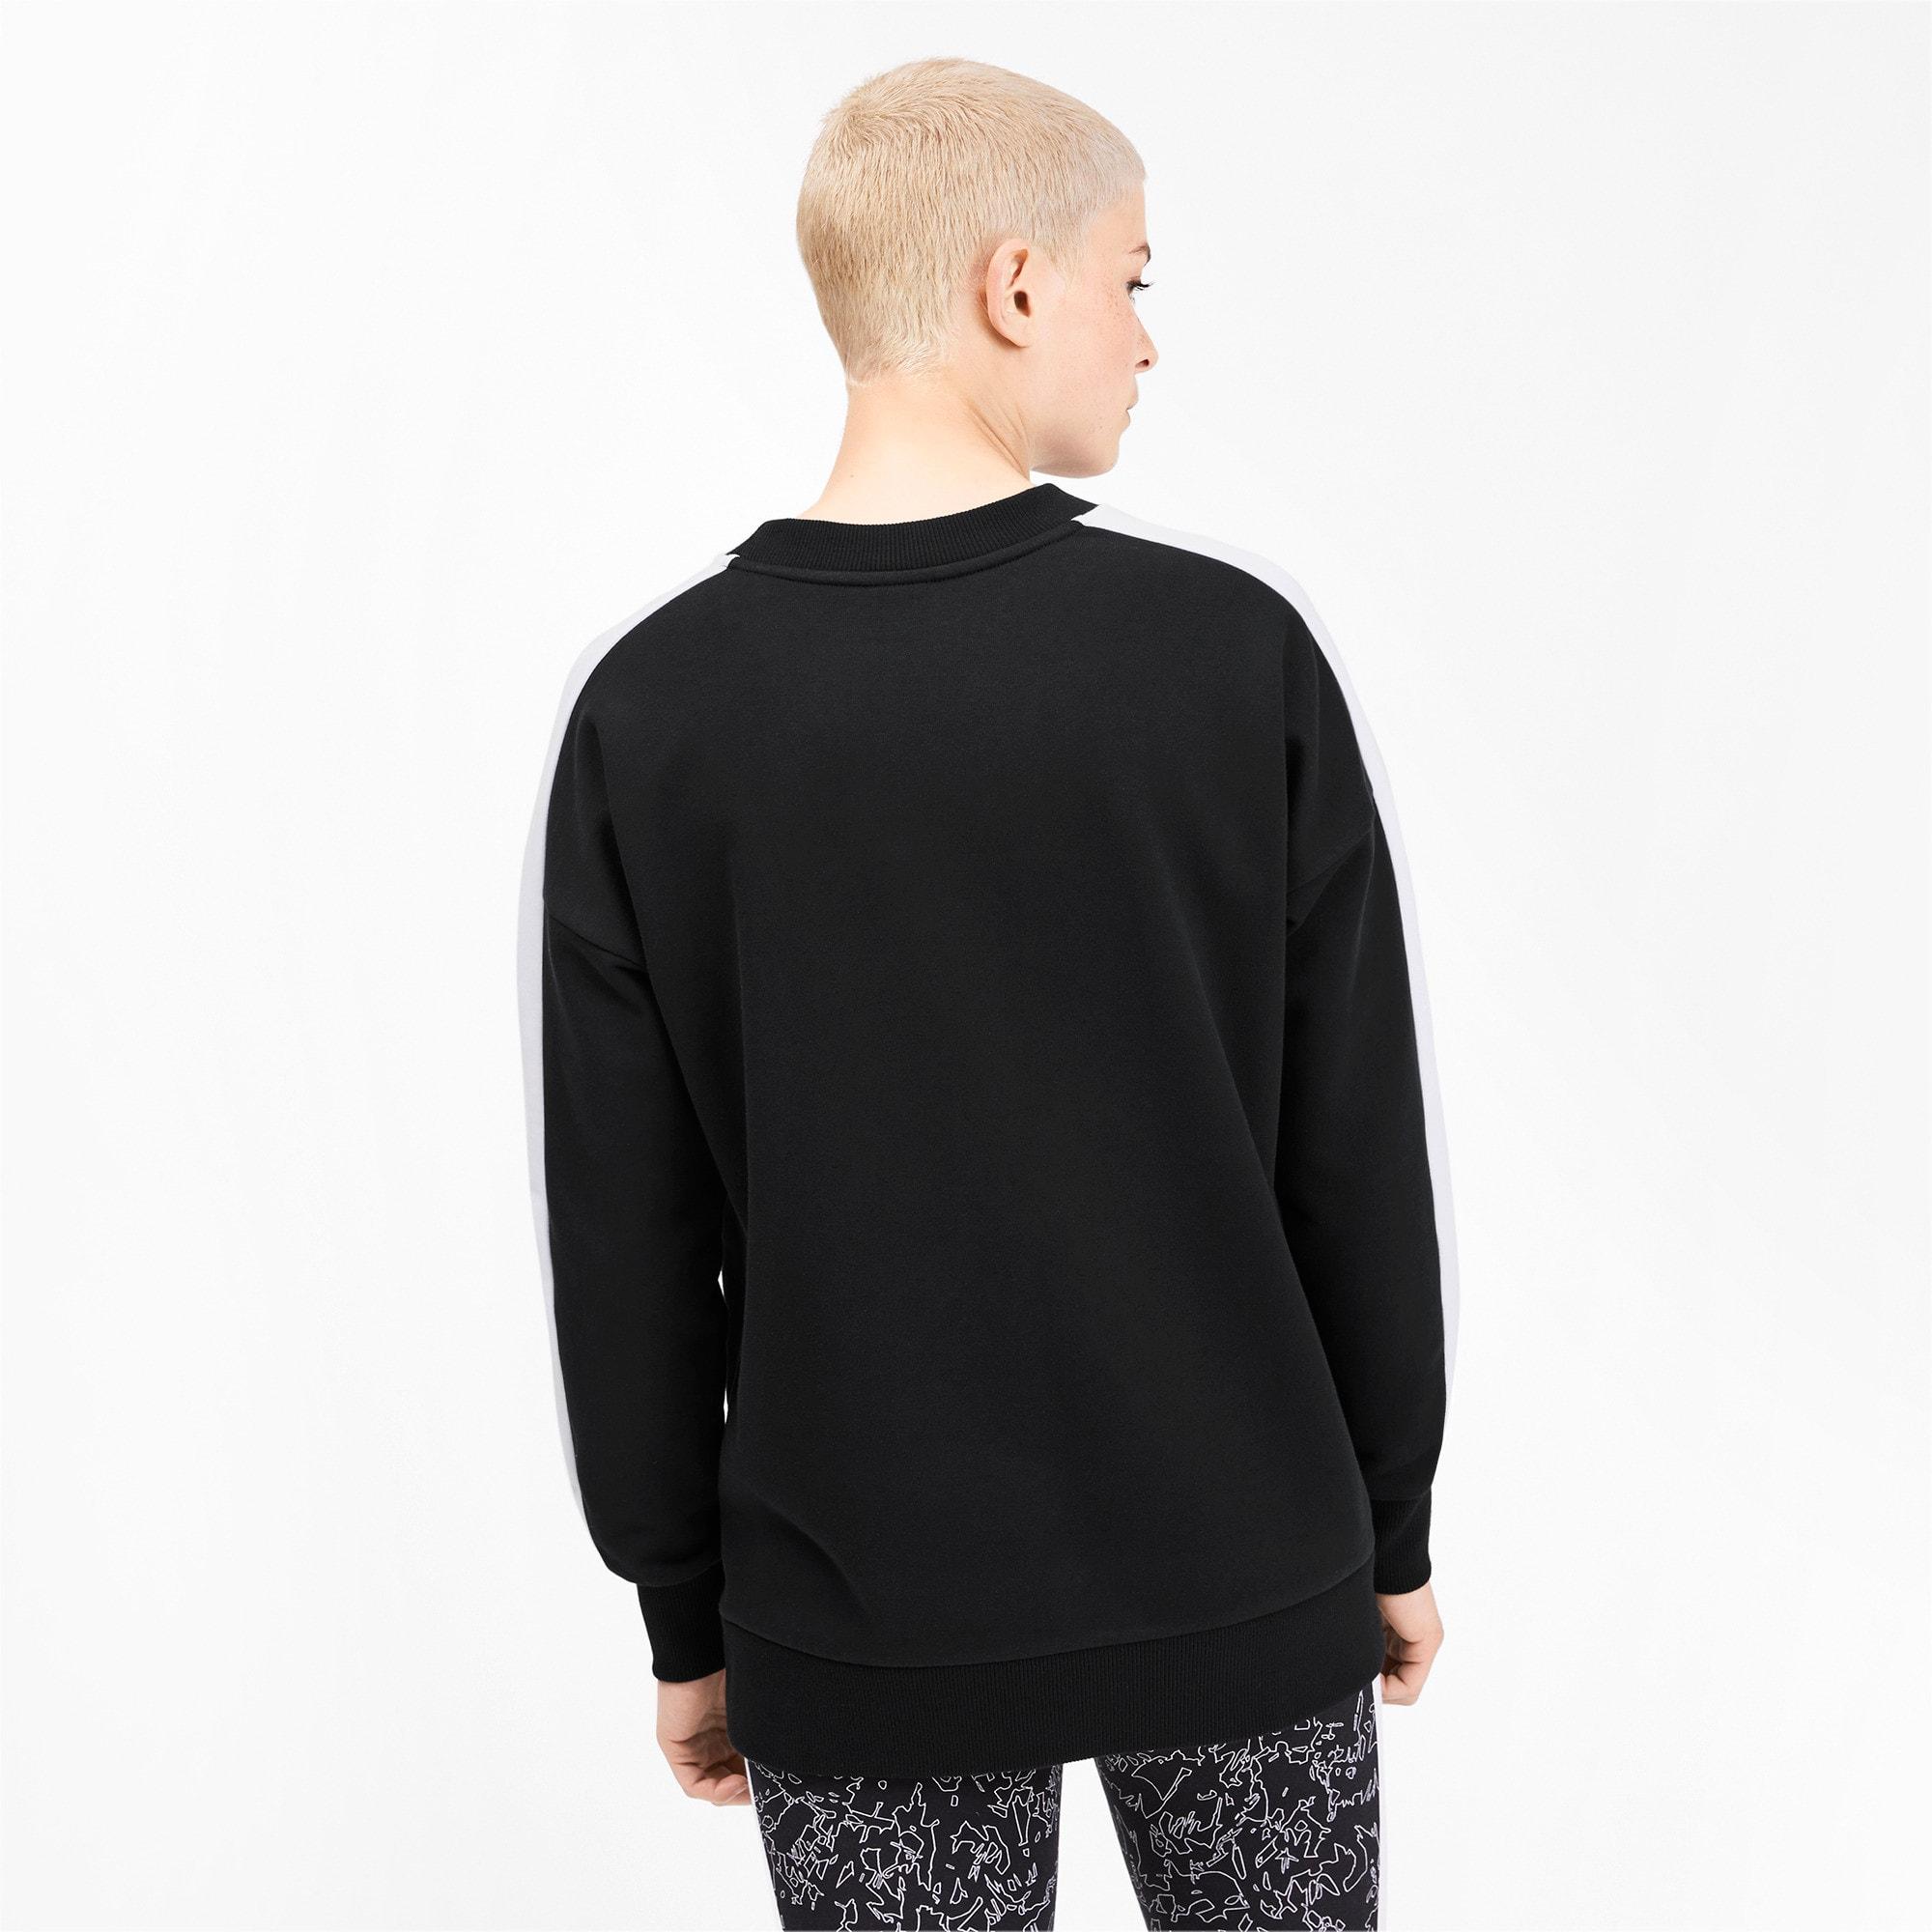 Thumbnail 3 of Classics T7 Women's Crewneck Sweatshirt, Puma Black, medium